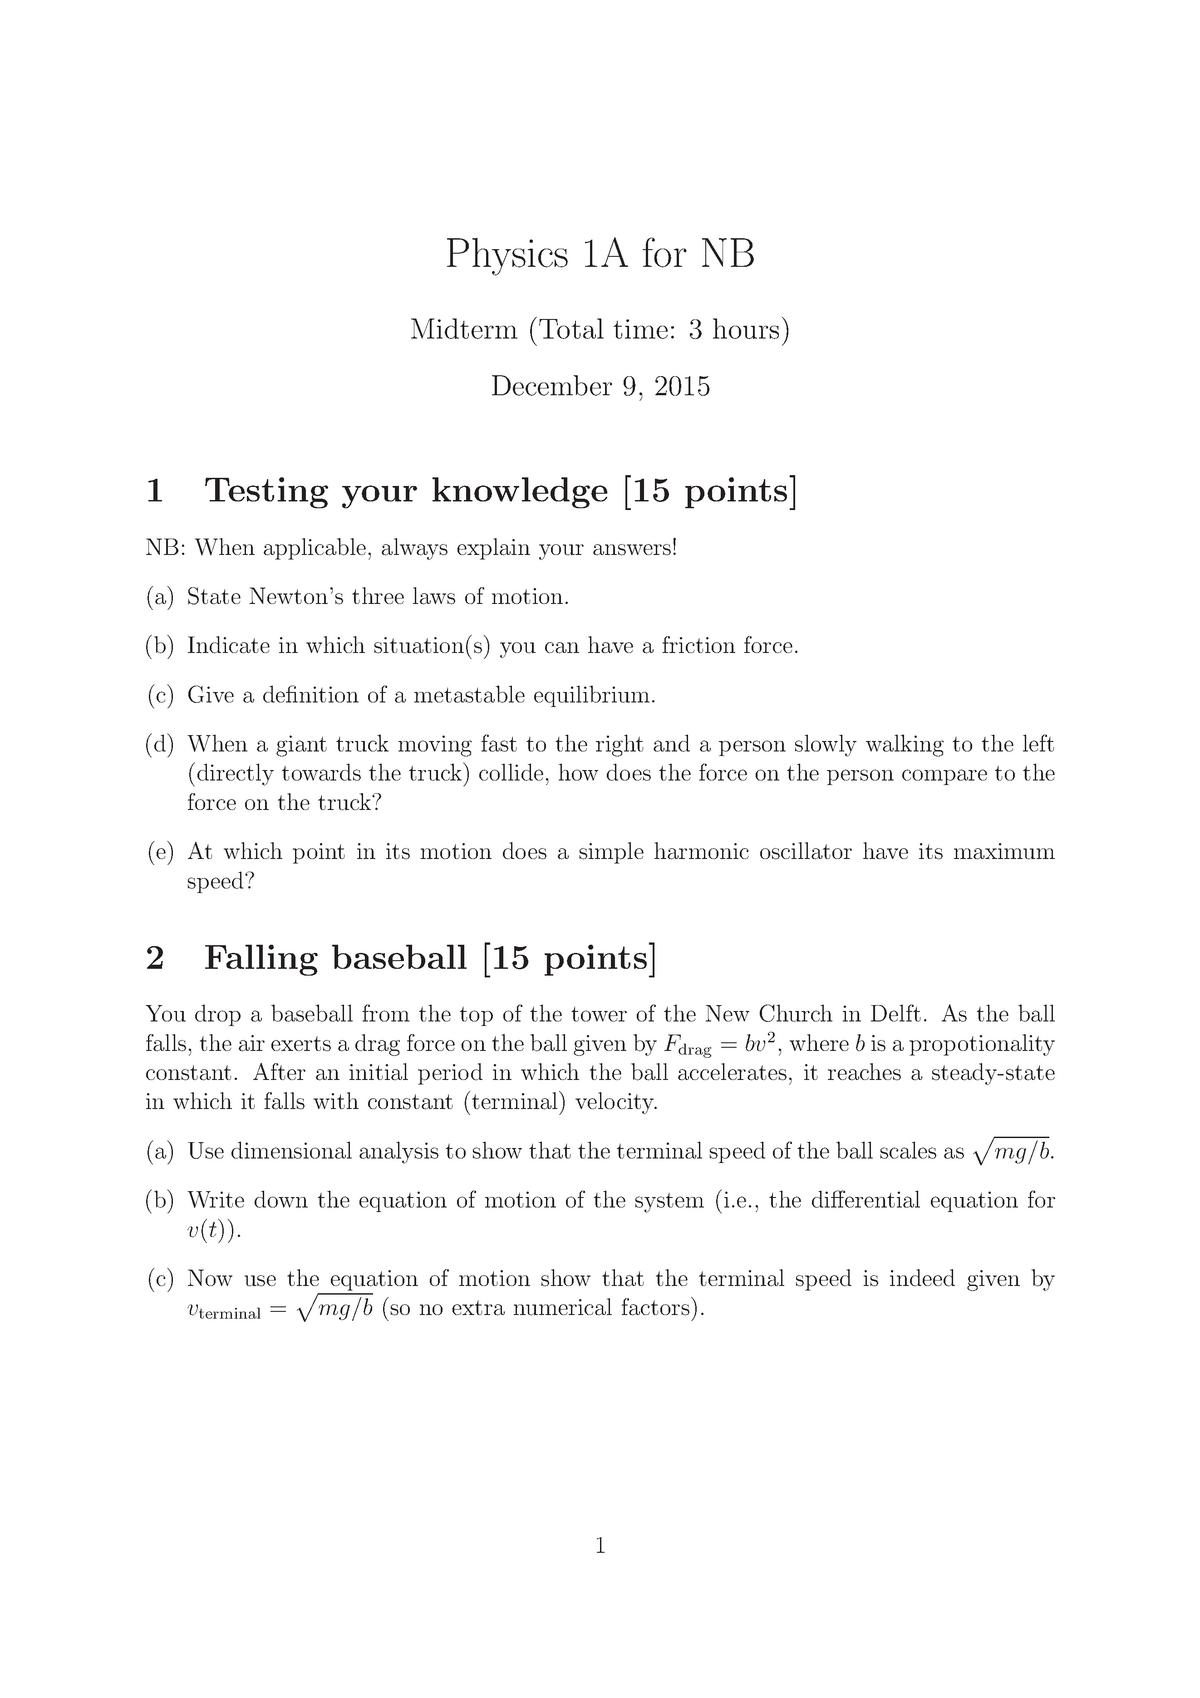 Tentamen 2015 - NB1140: Physics 1a - StudeerSnel nl